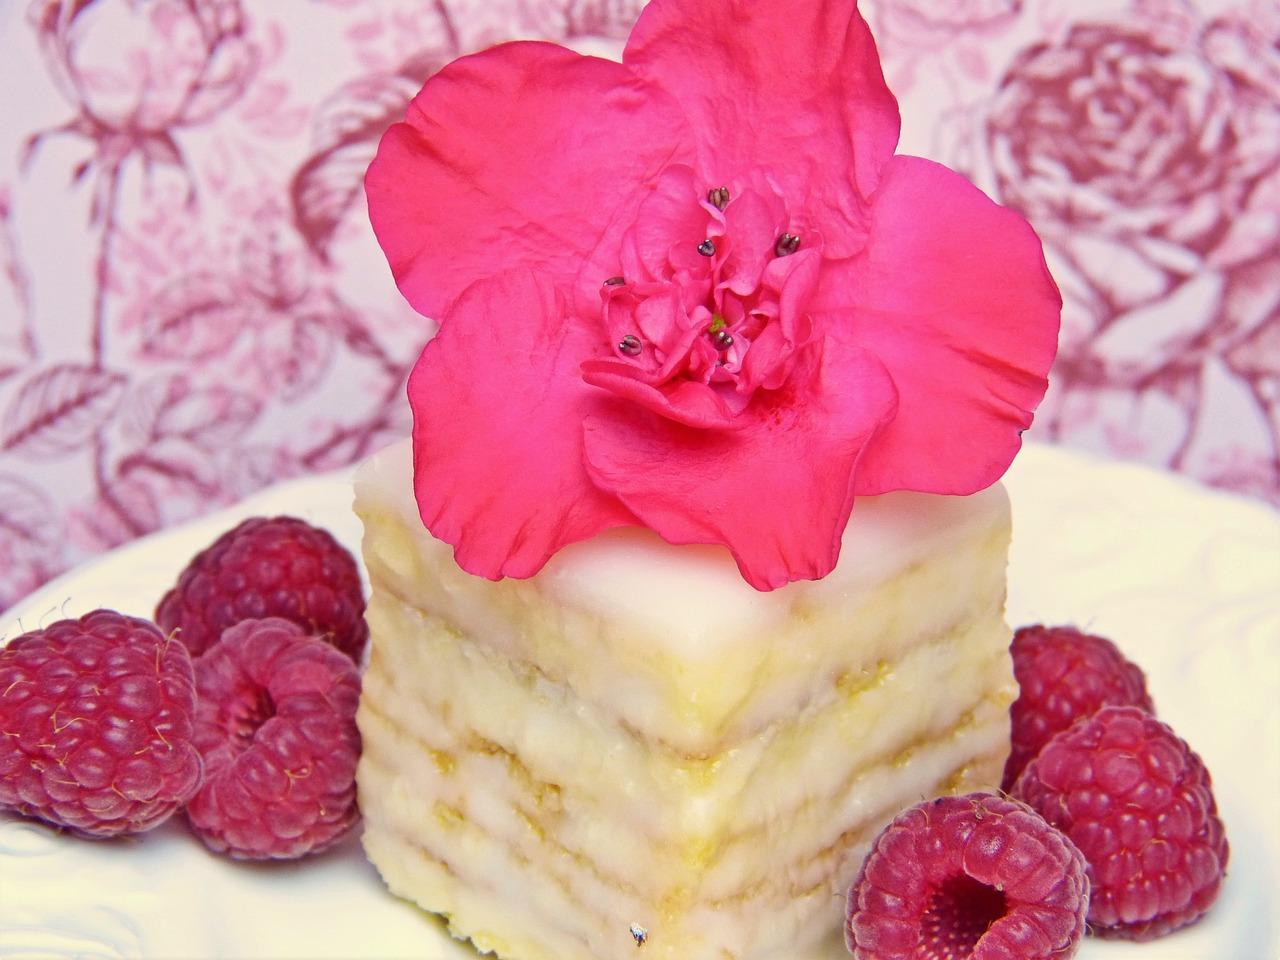 Gluten free cake with red raspberries.